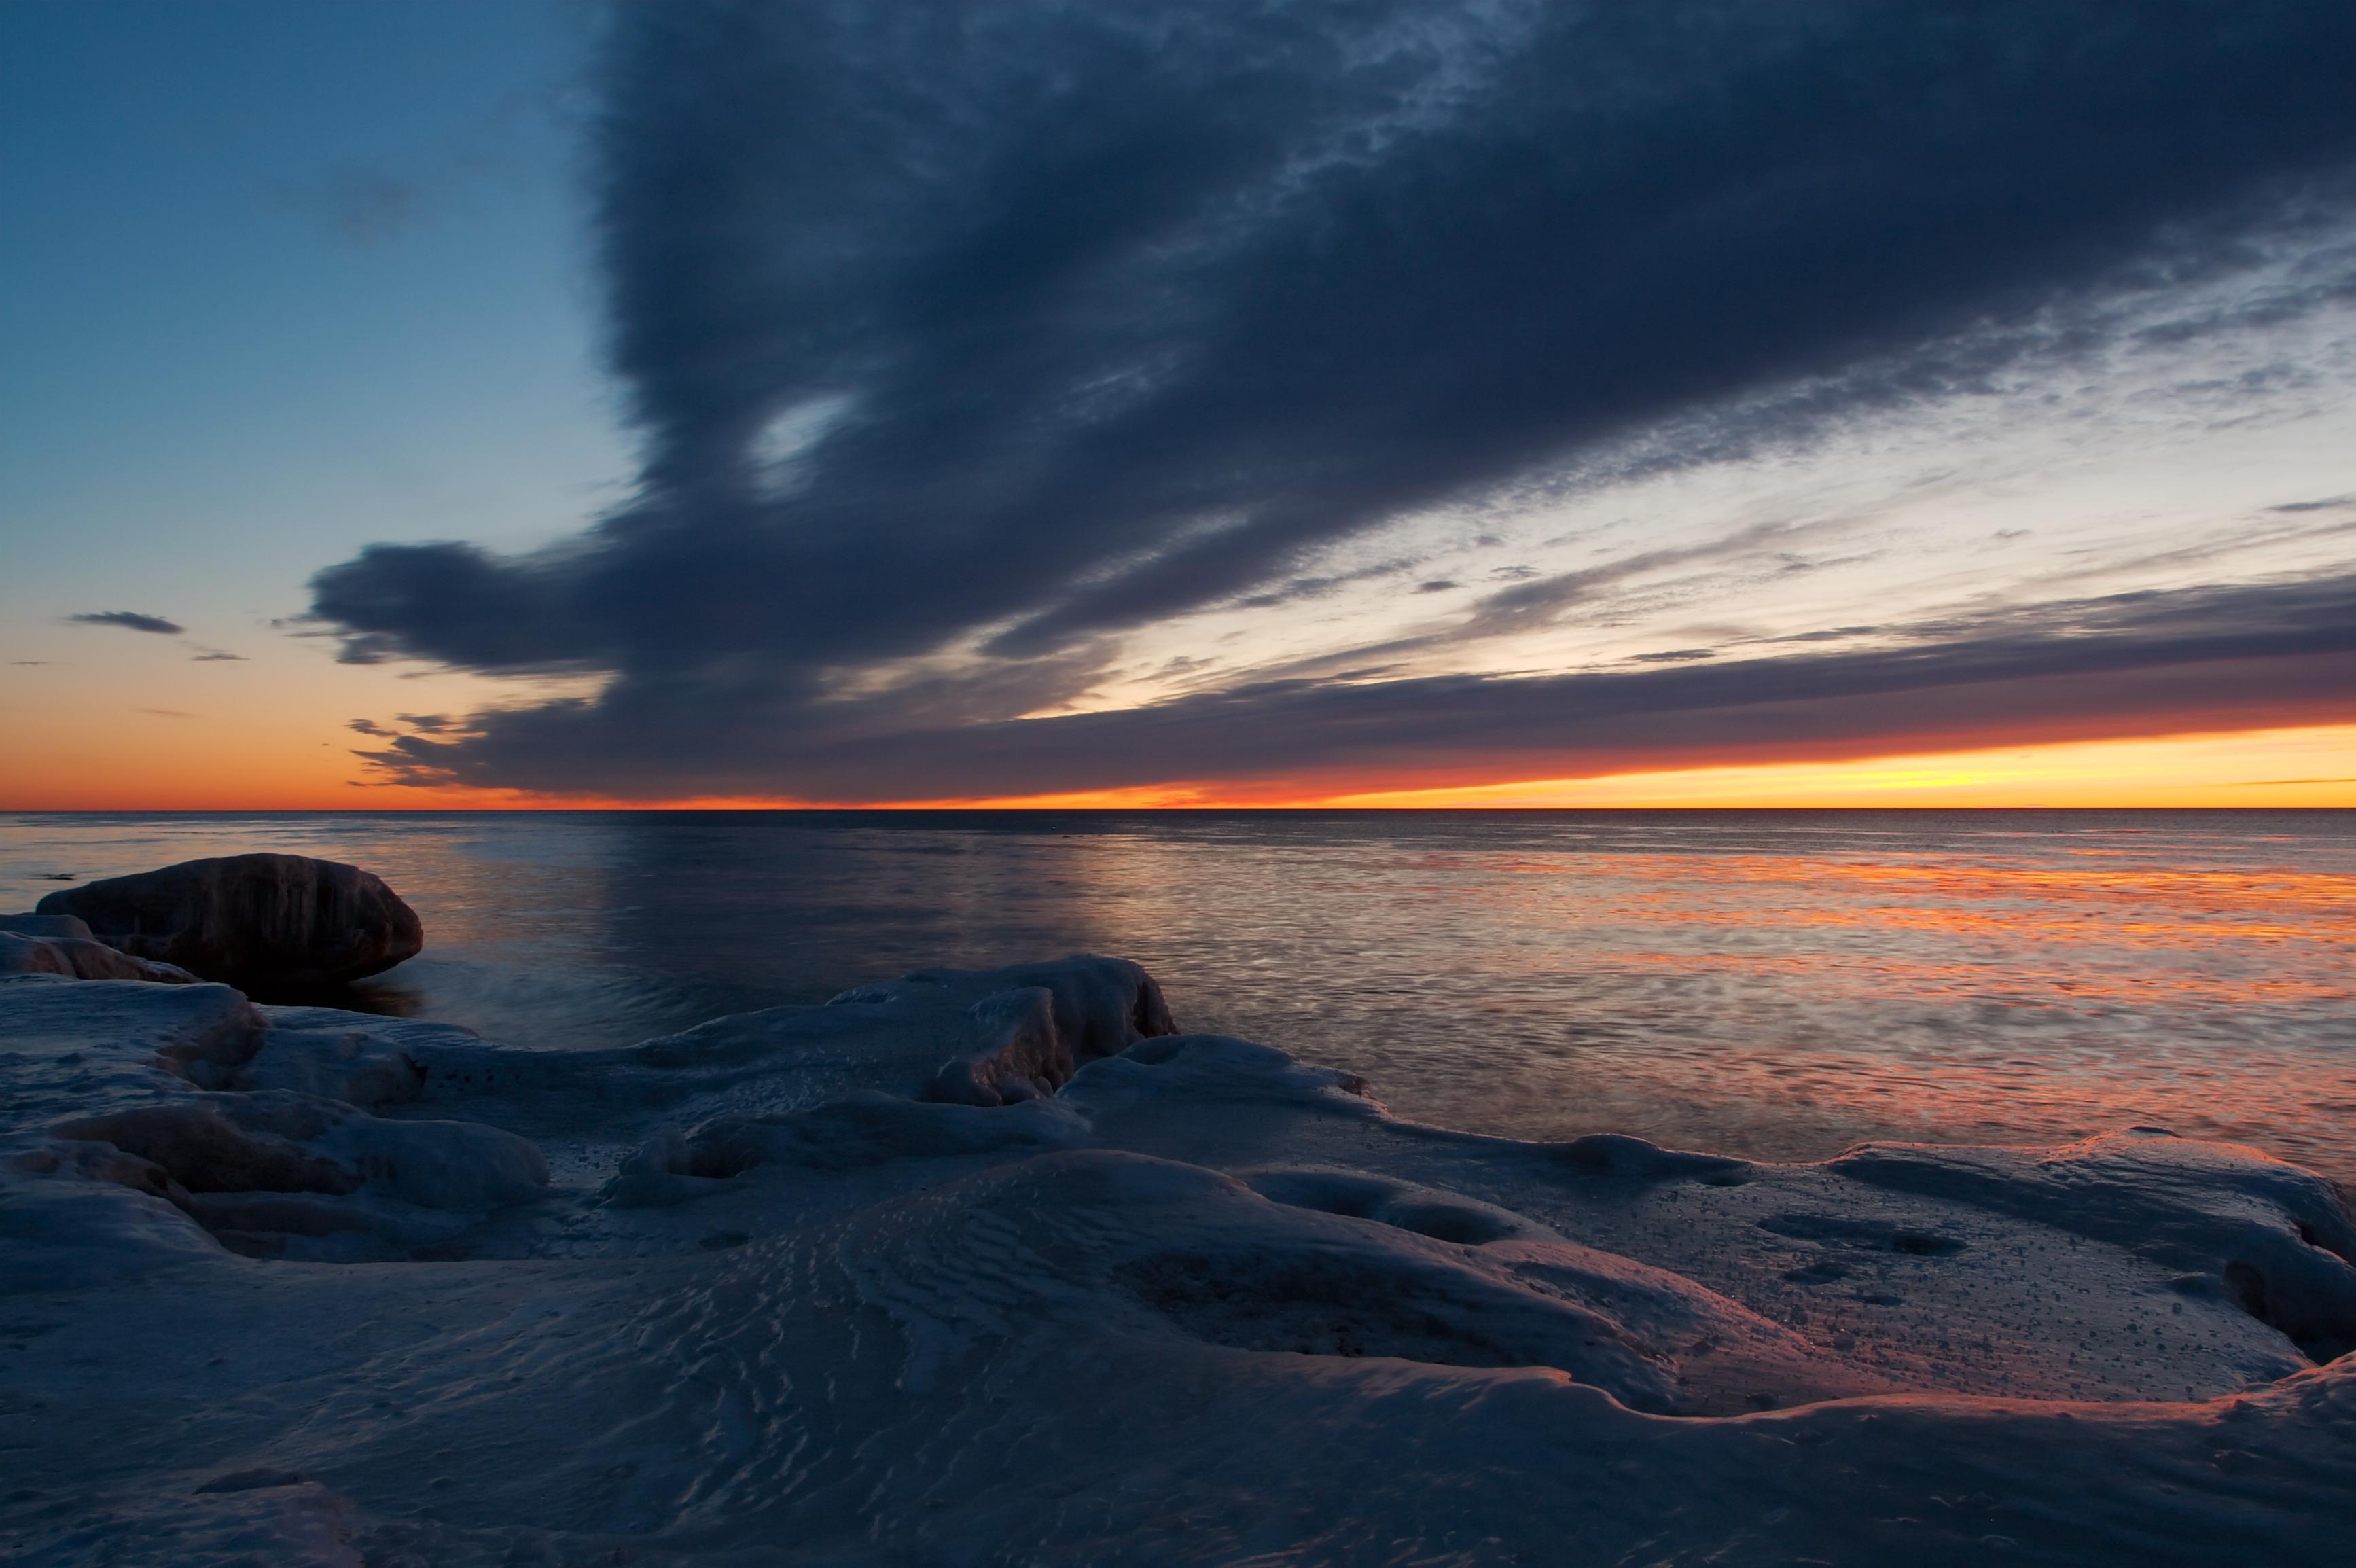 English: Sunrise at North Point Park, Milwauke...